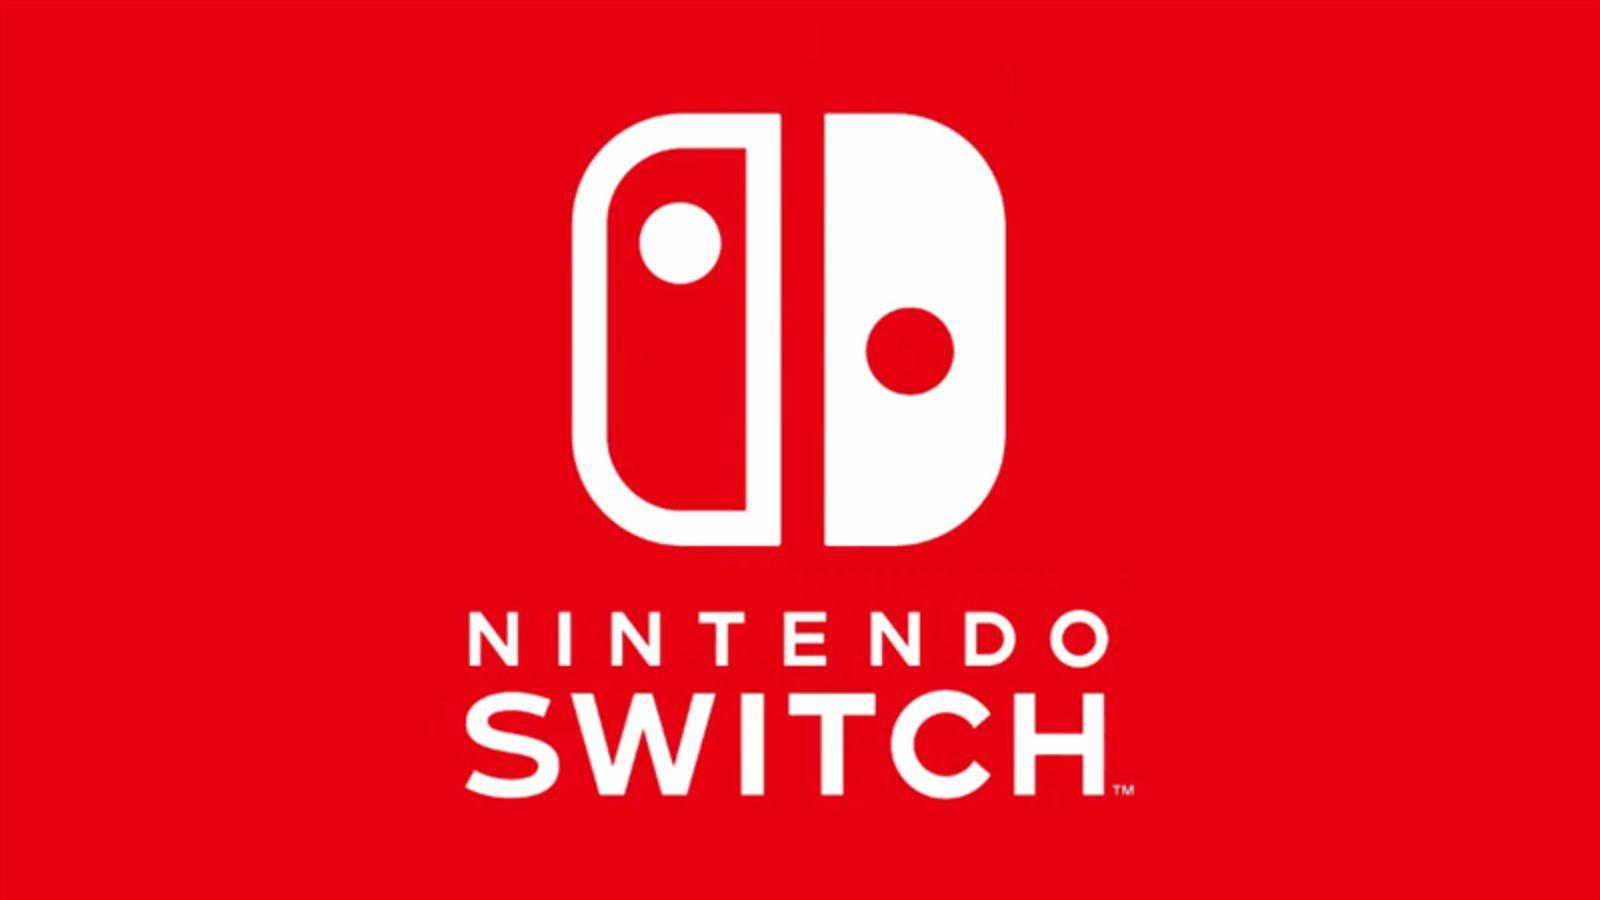 Nintendo Switch - 10% Discount